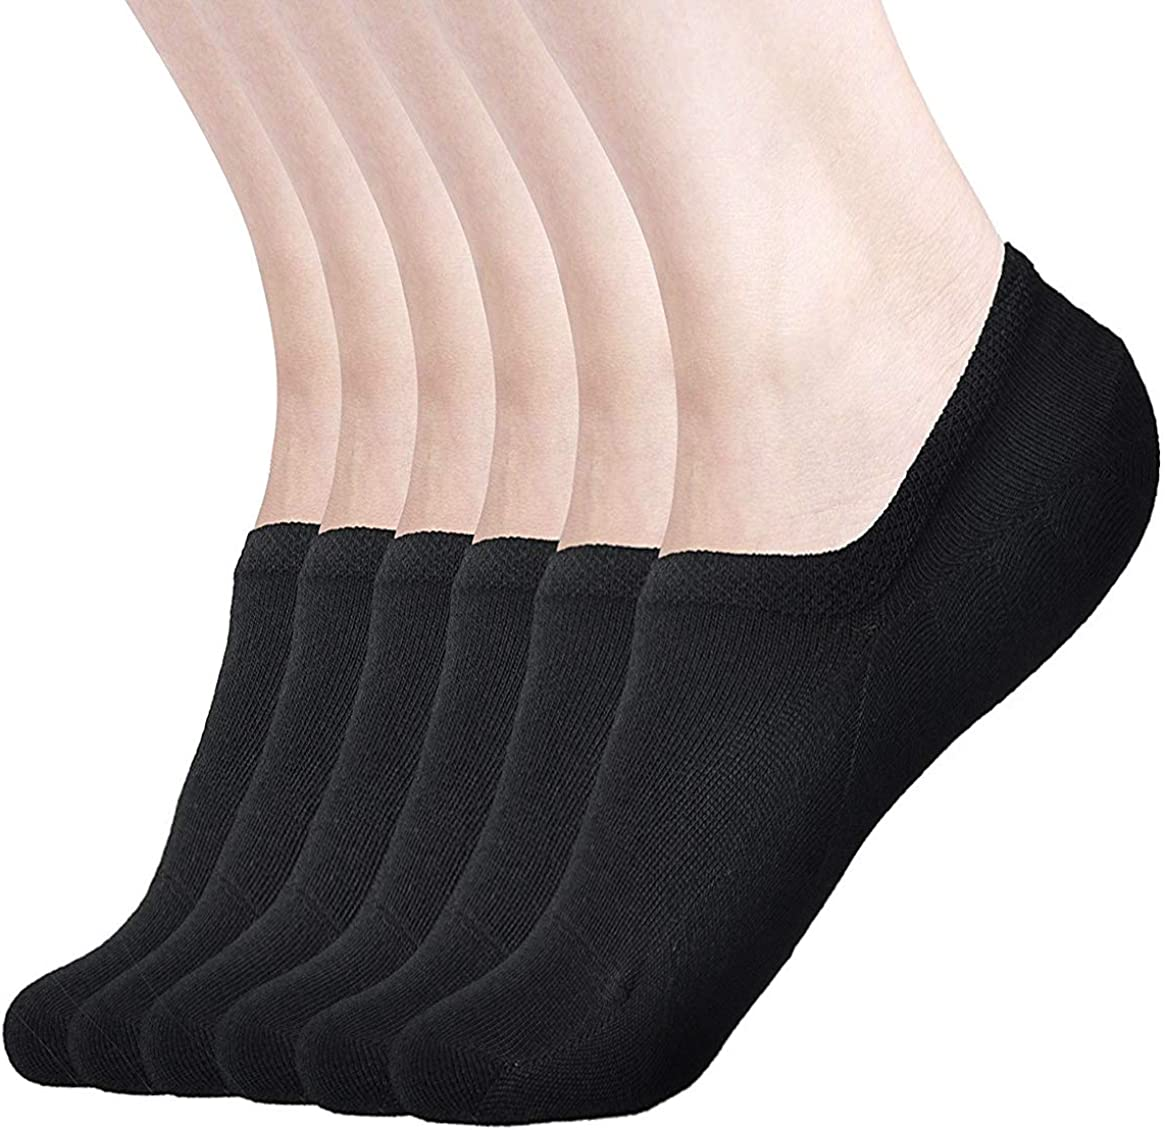 Womens No Show Socks Non Slip Flat Boat Line Low Cut Socks ( 3-6 Packs )